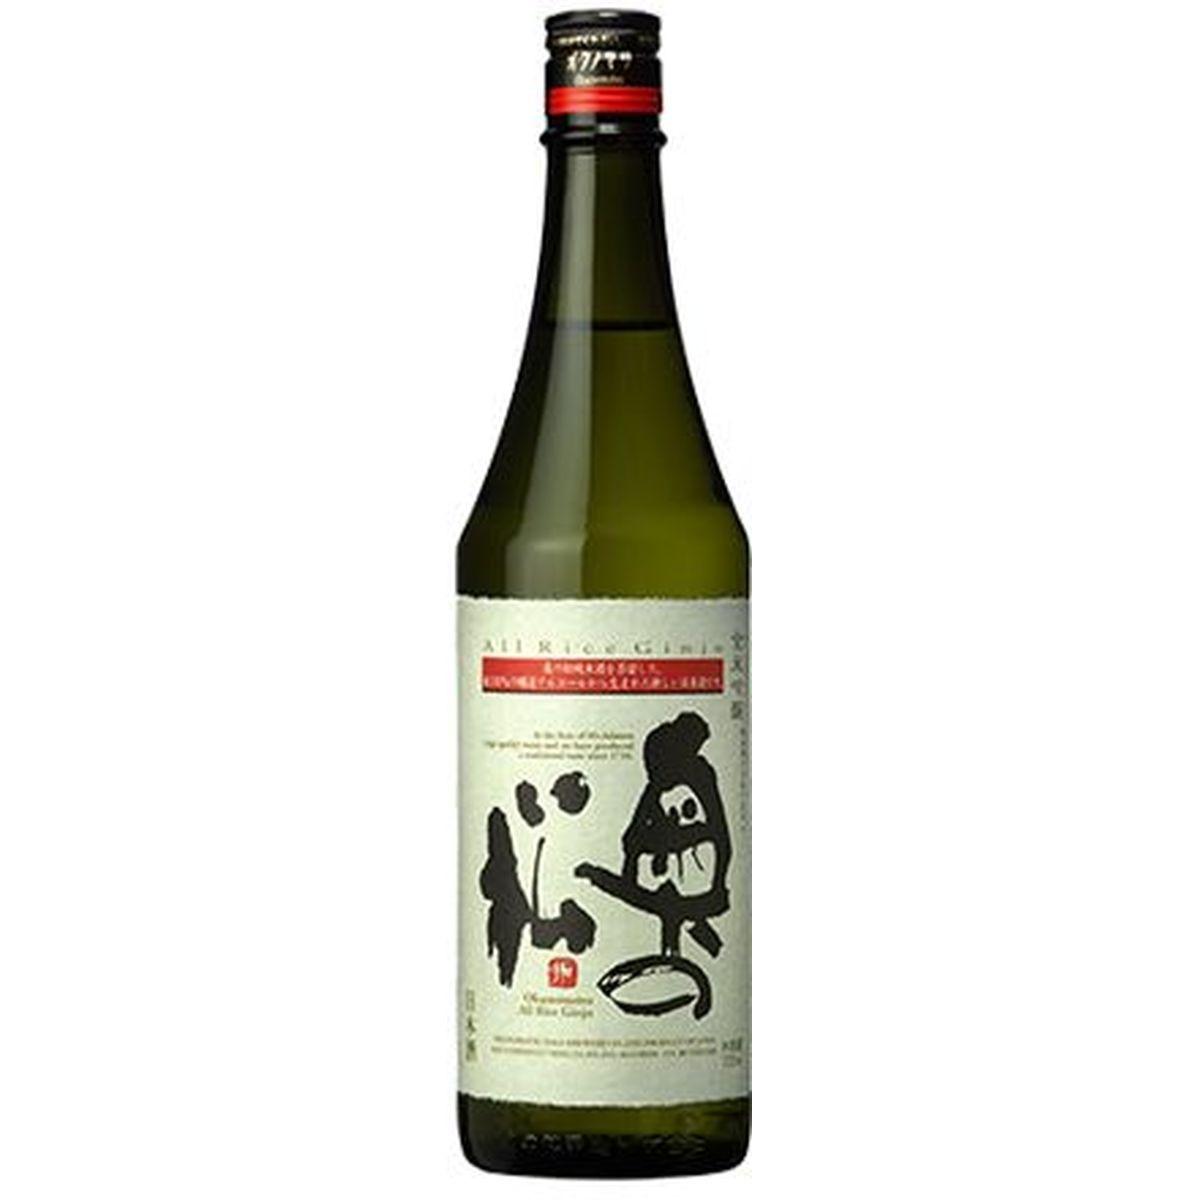 清酒 奥の松 全米吟醸 720ml